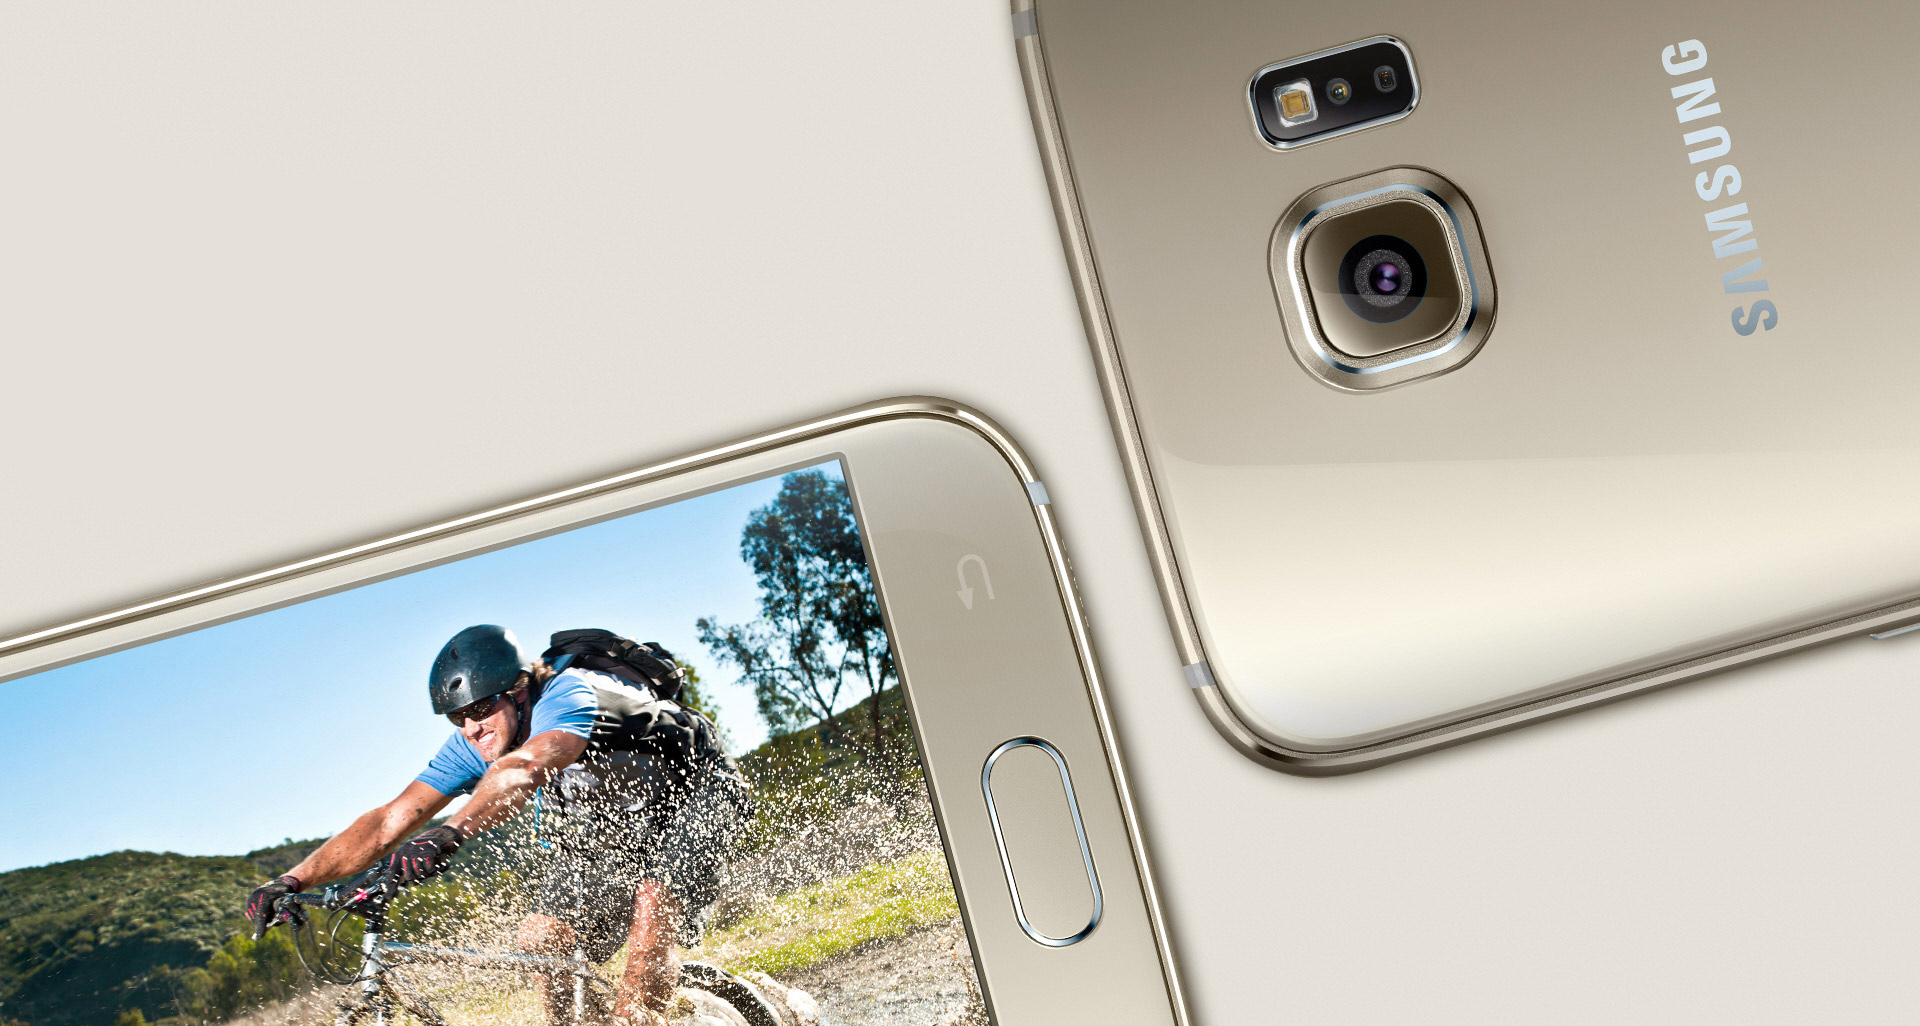 Galaxy-s7-camera-rumors